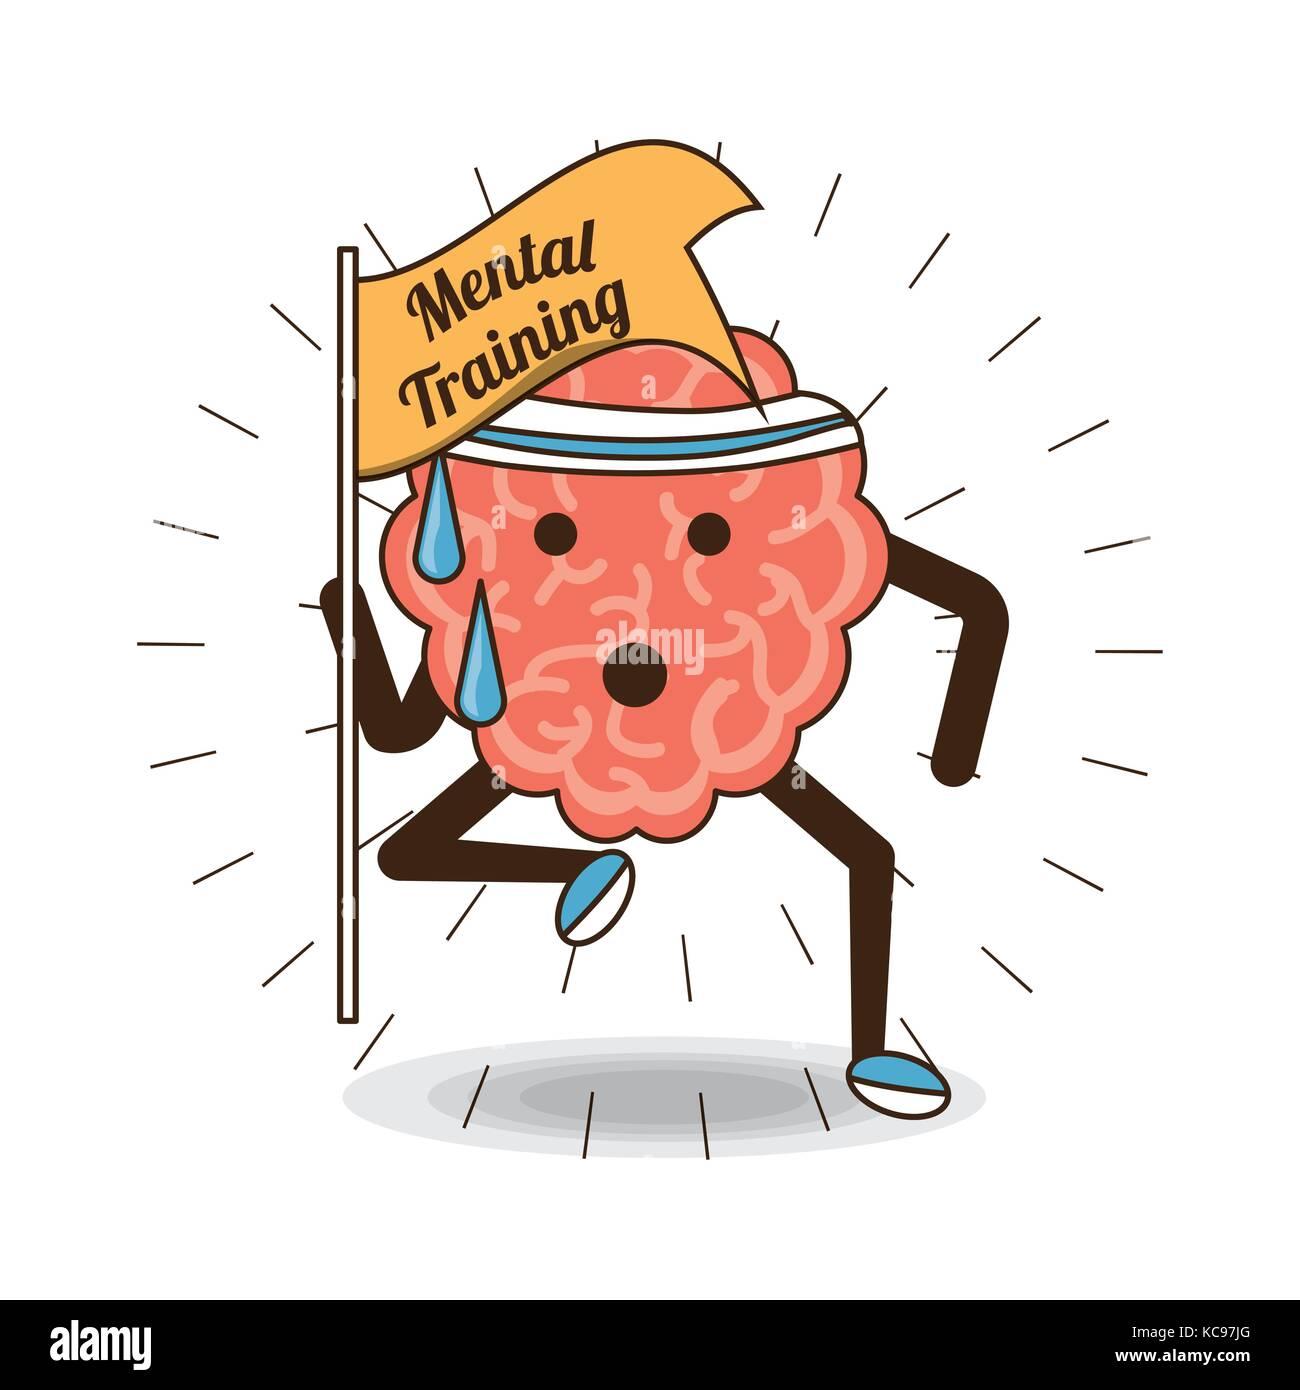 Mental health design - Stock Image